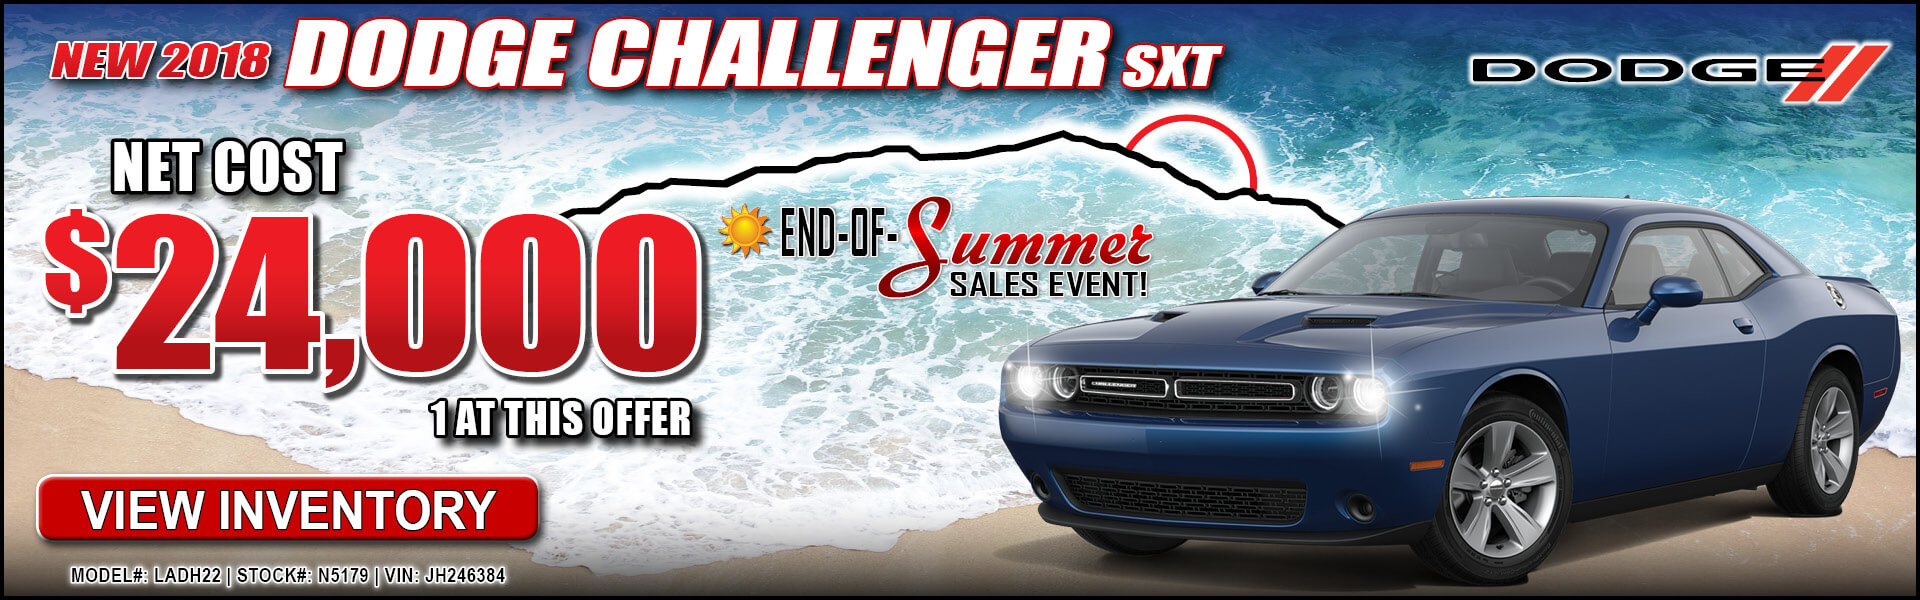 Dodge Challenger $24,000